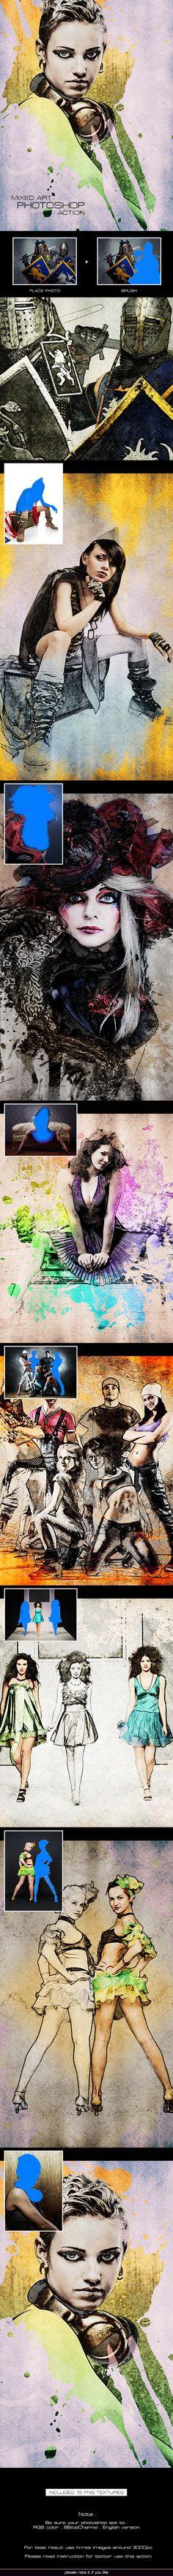 artist photoshop action free download